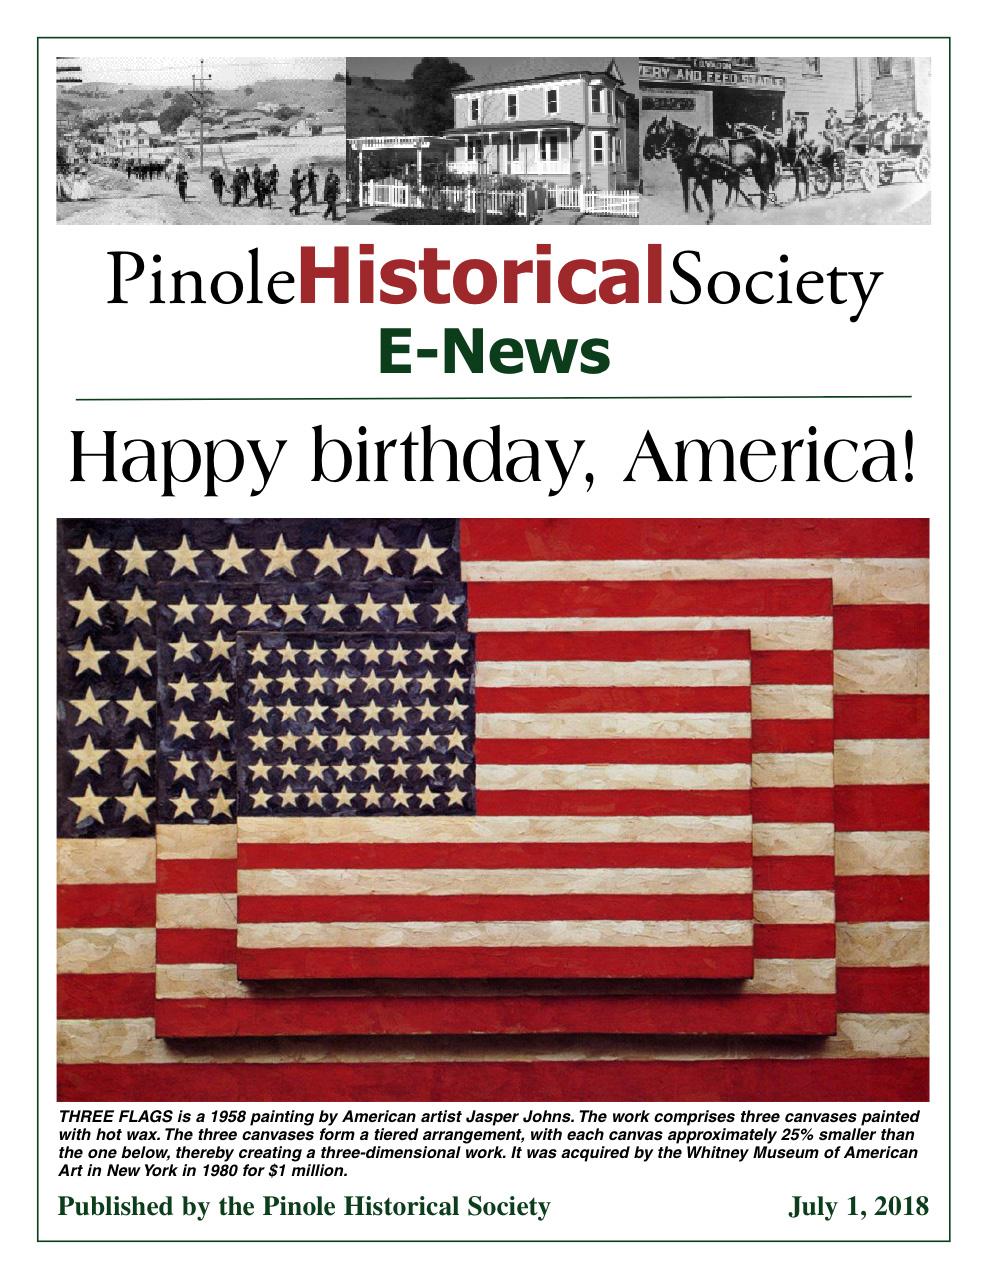 Pinole Historical Society